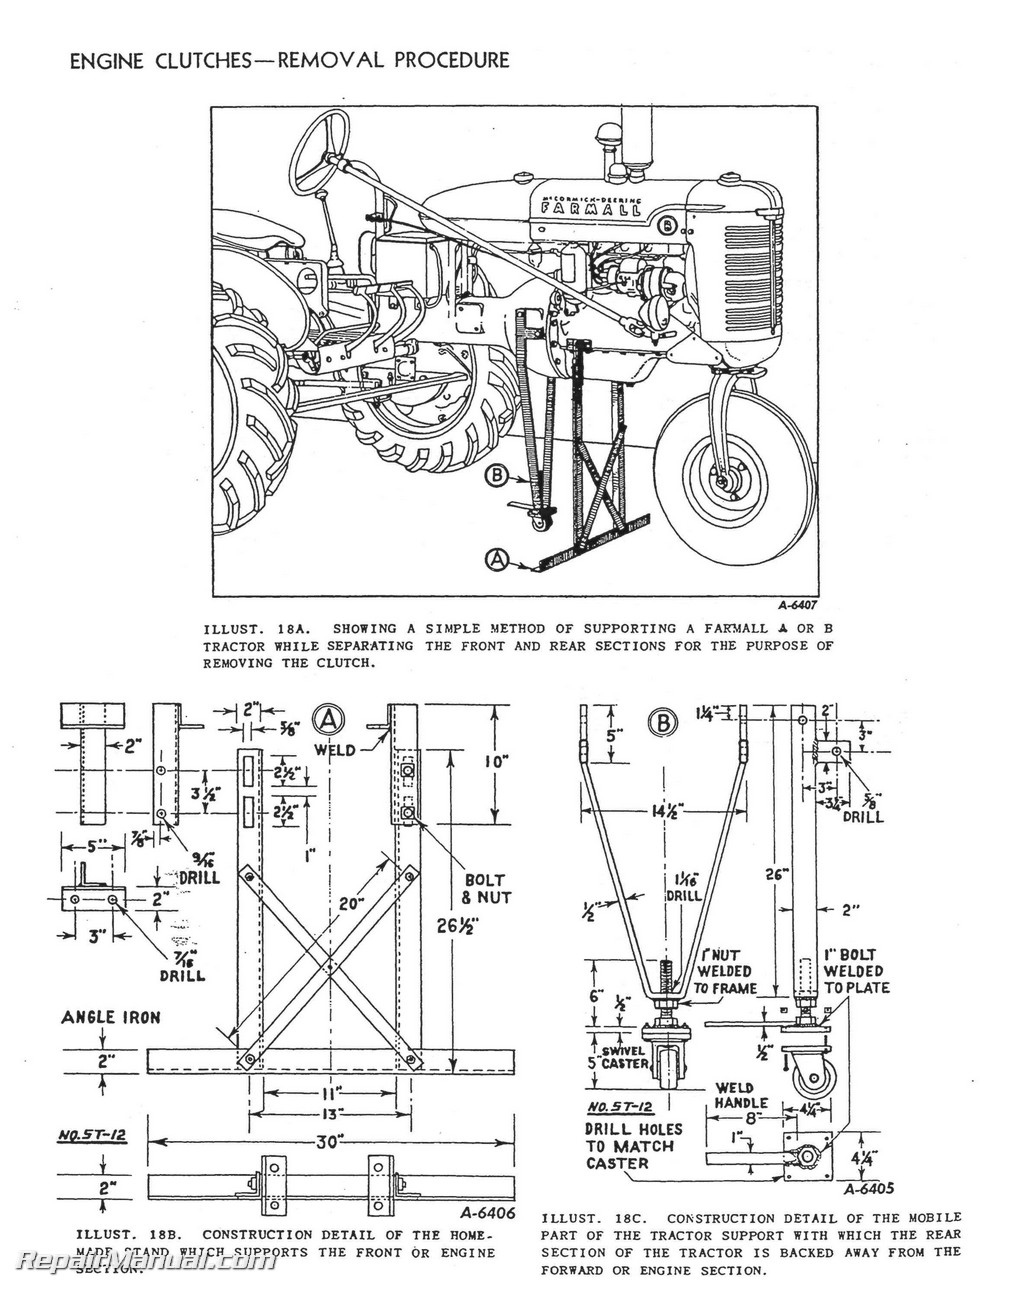 wiring diagram for farmall h zf 0361  farmall h tractor wiring diagram on farmall cub  tractor wiring diagram on farmall cub